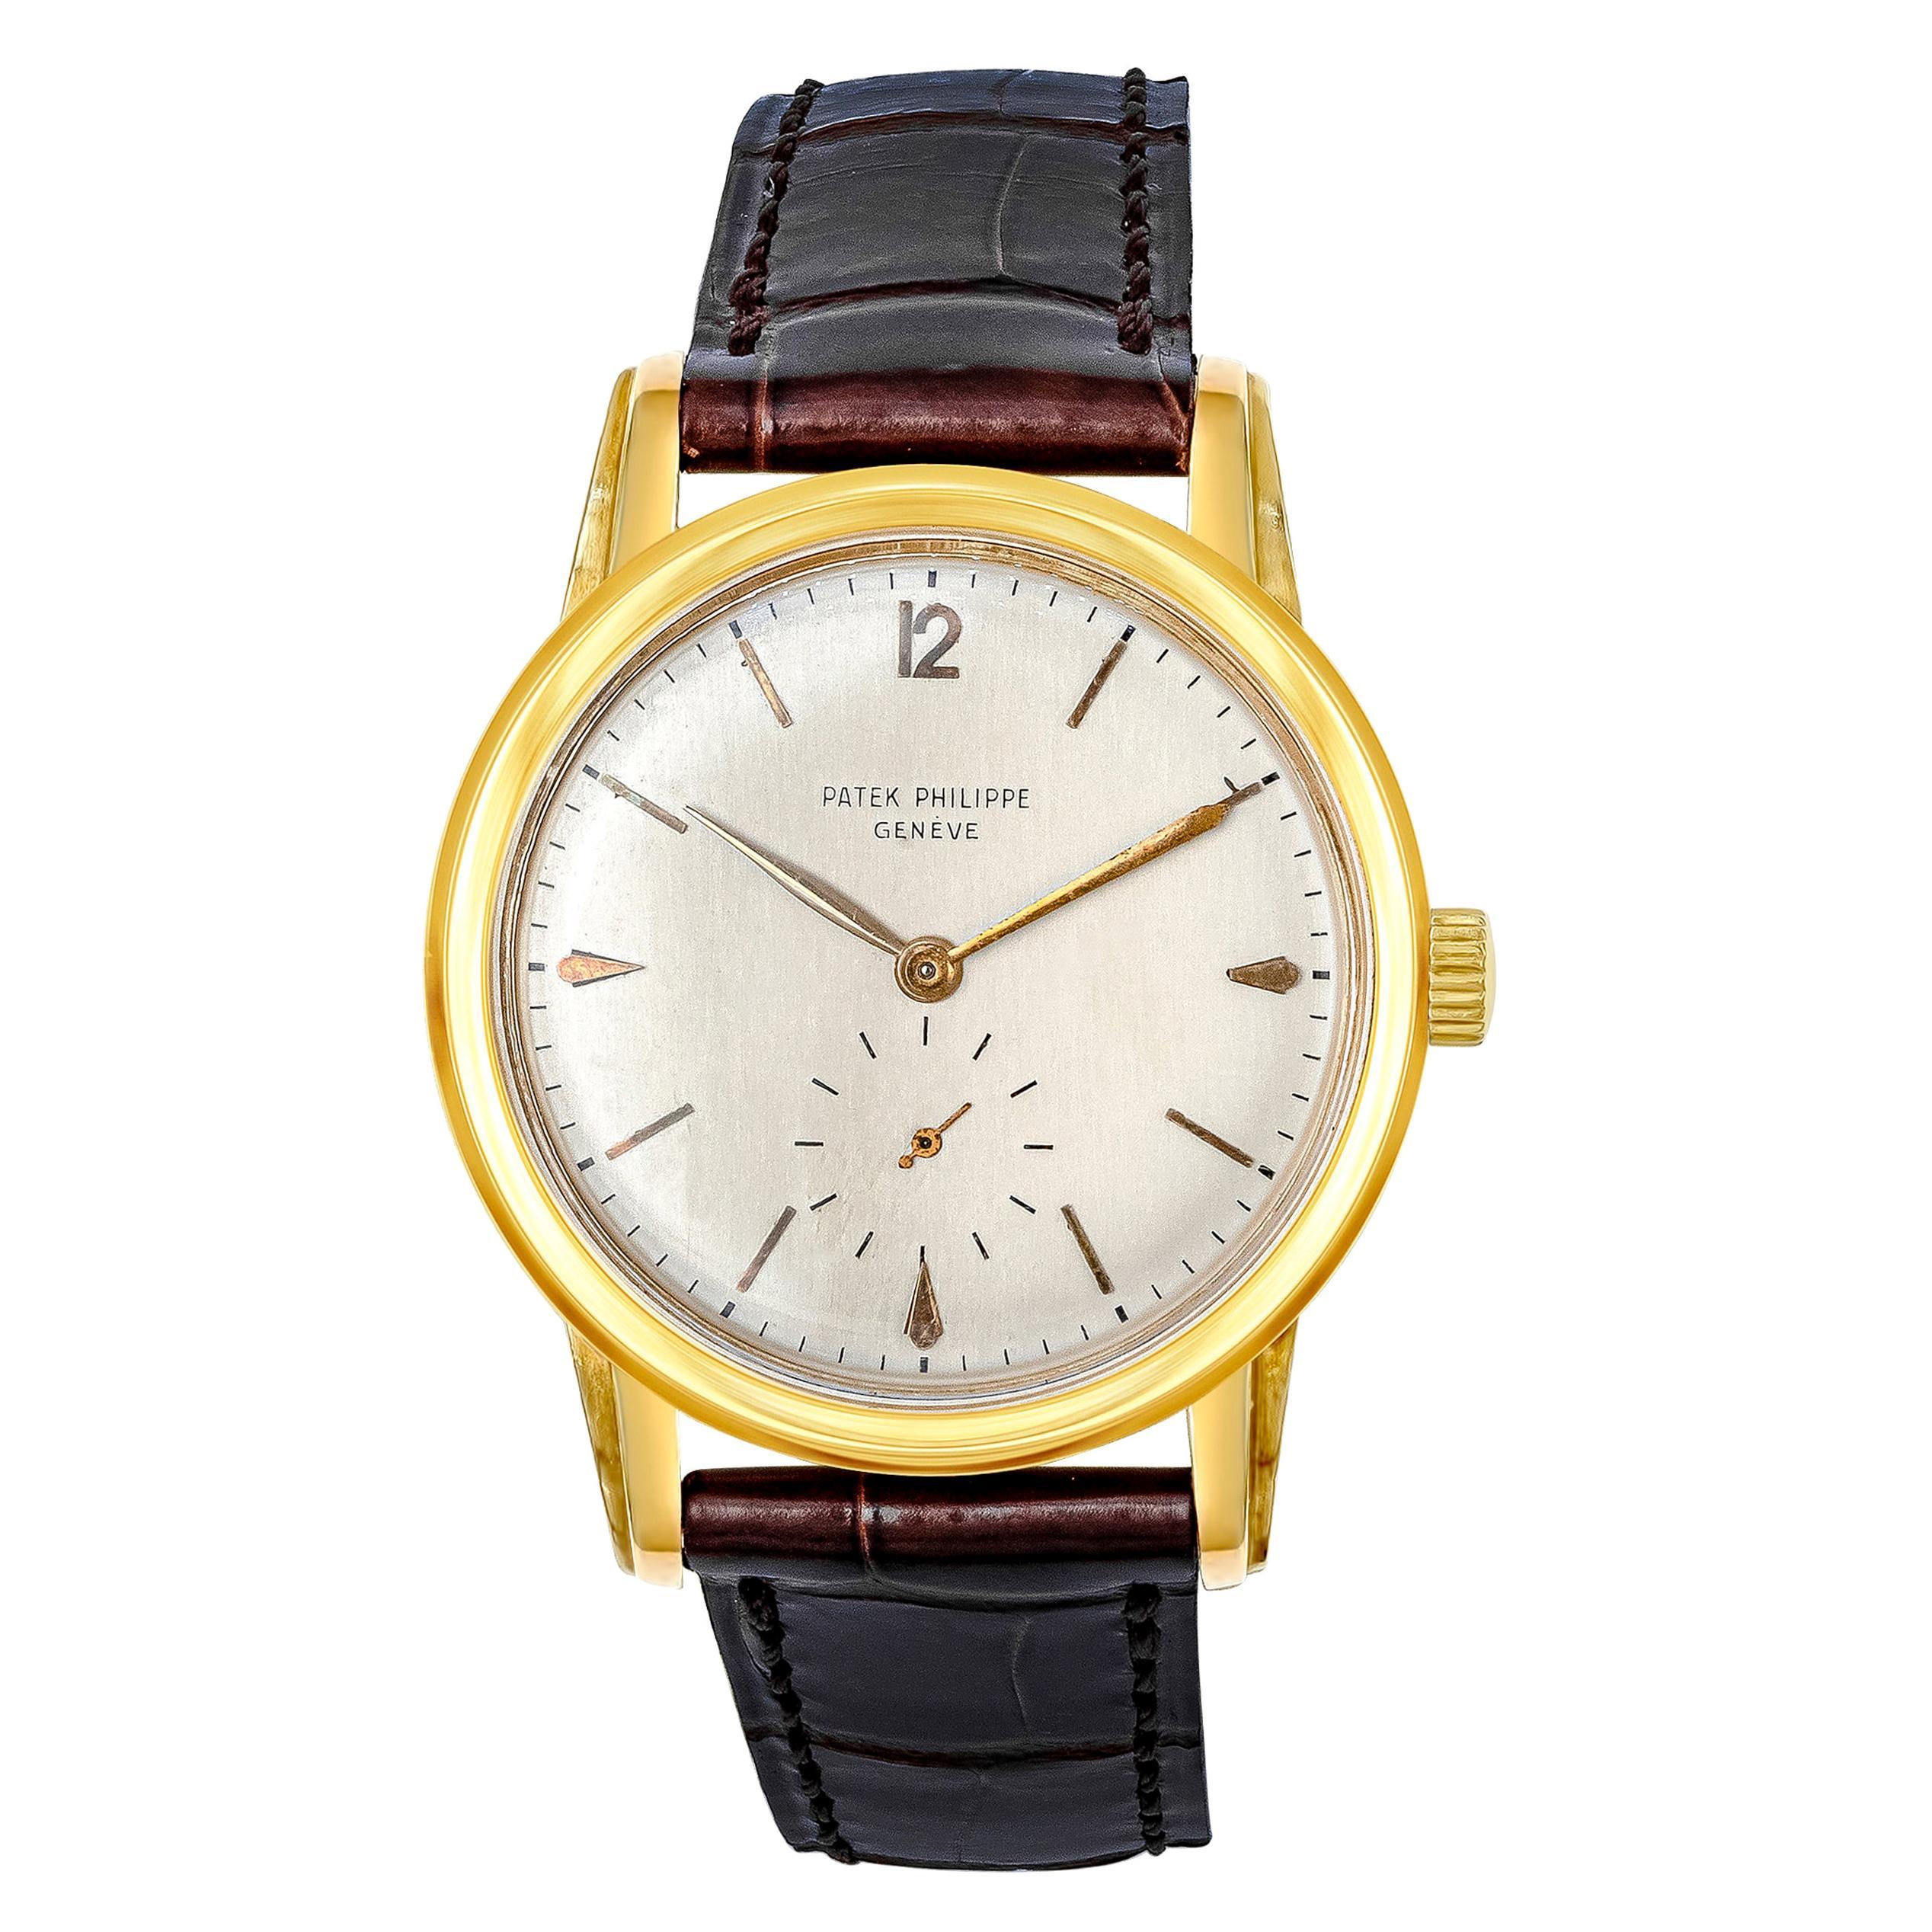 Vintage Patek Philippe Calatrava Yellow Gold Wristwatch Ref. 2452J